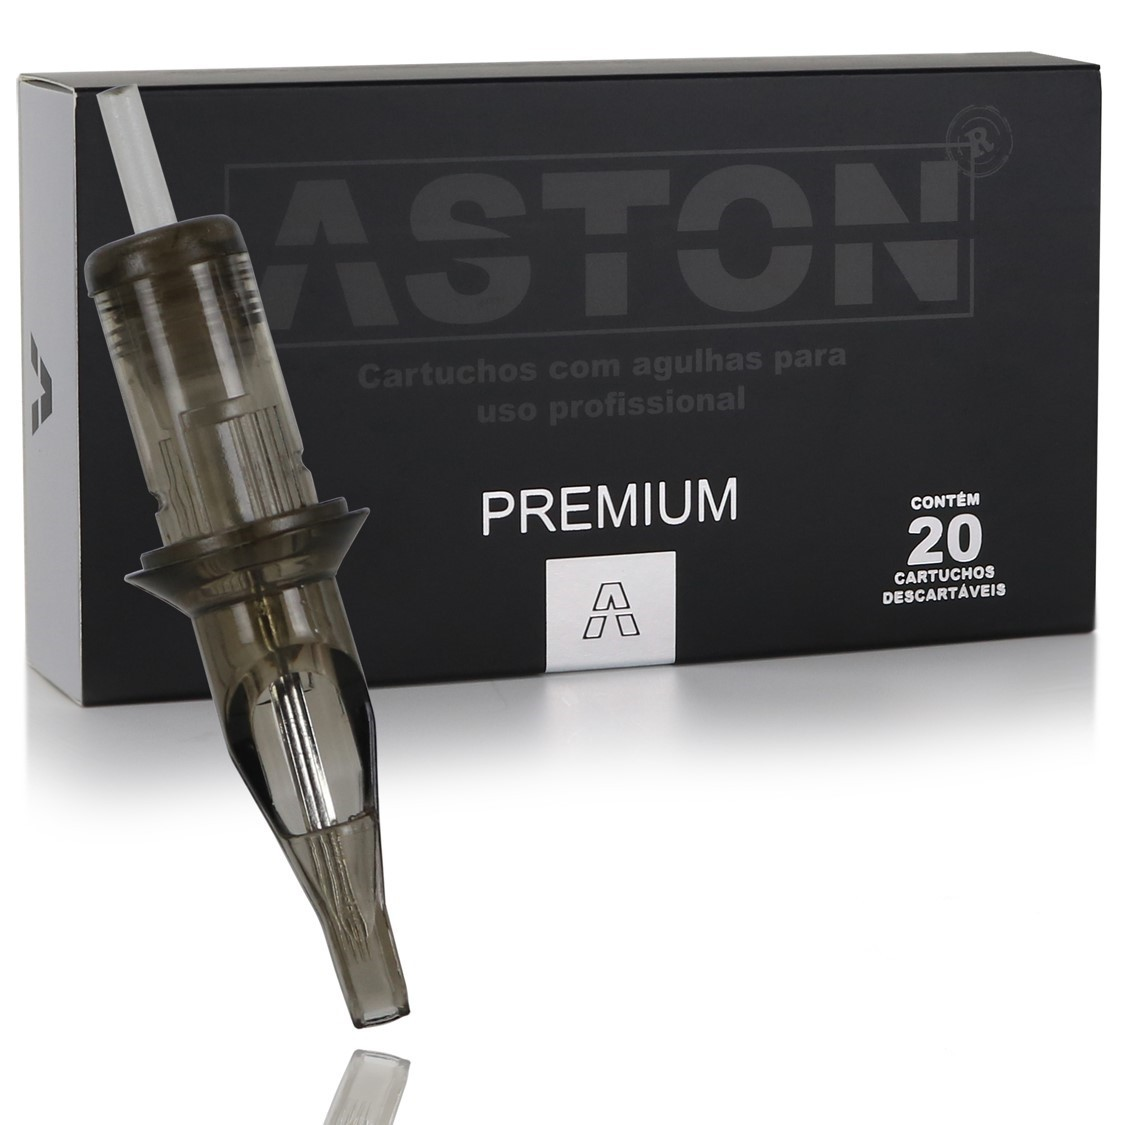 CAIXA CARTUCHO ASTON PREMIUM PINTURA MR (20 UN) - 1023MR